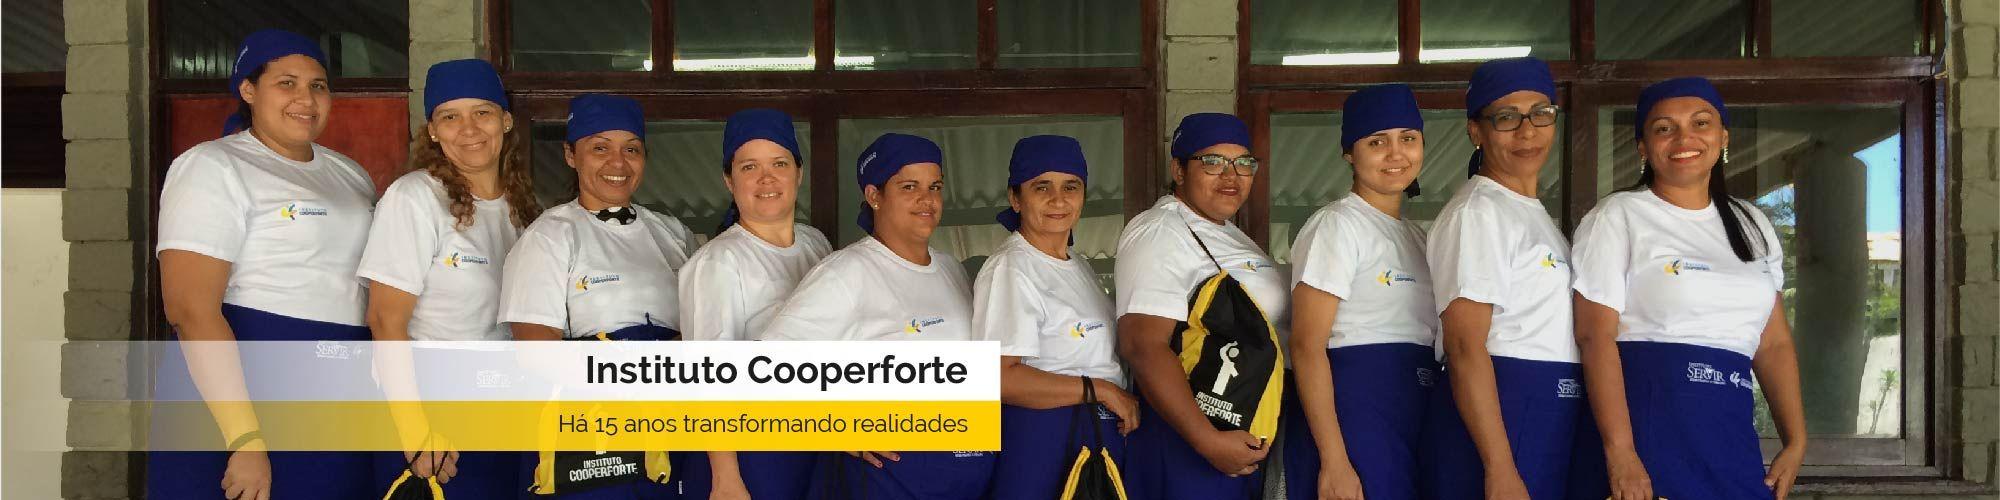 Instituto-Cooperforte---banner-01